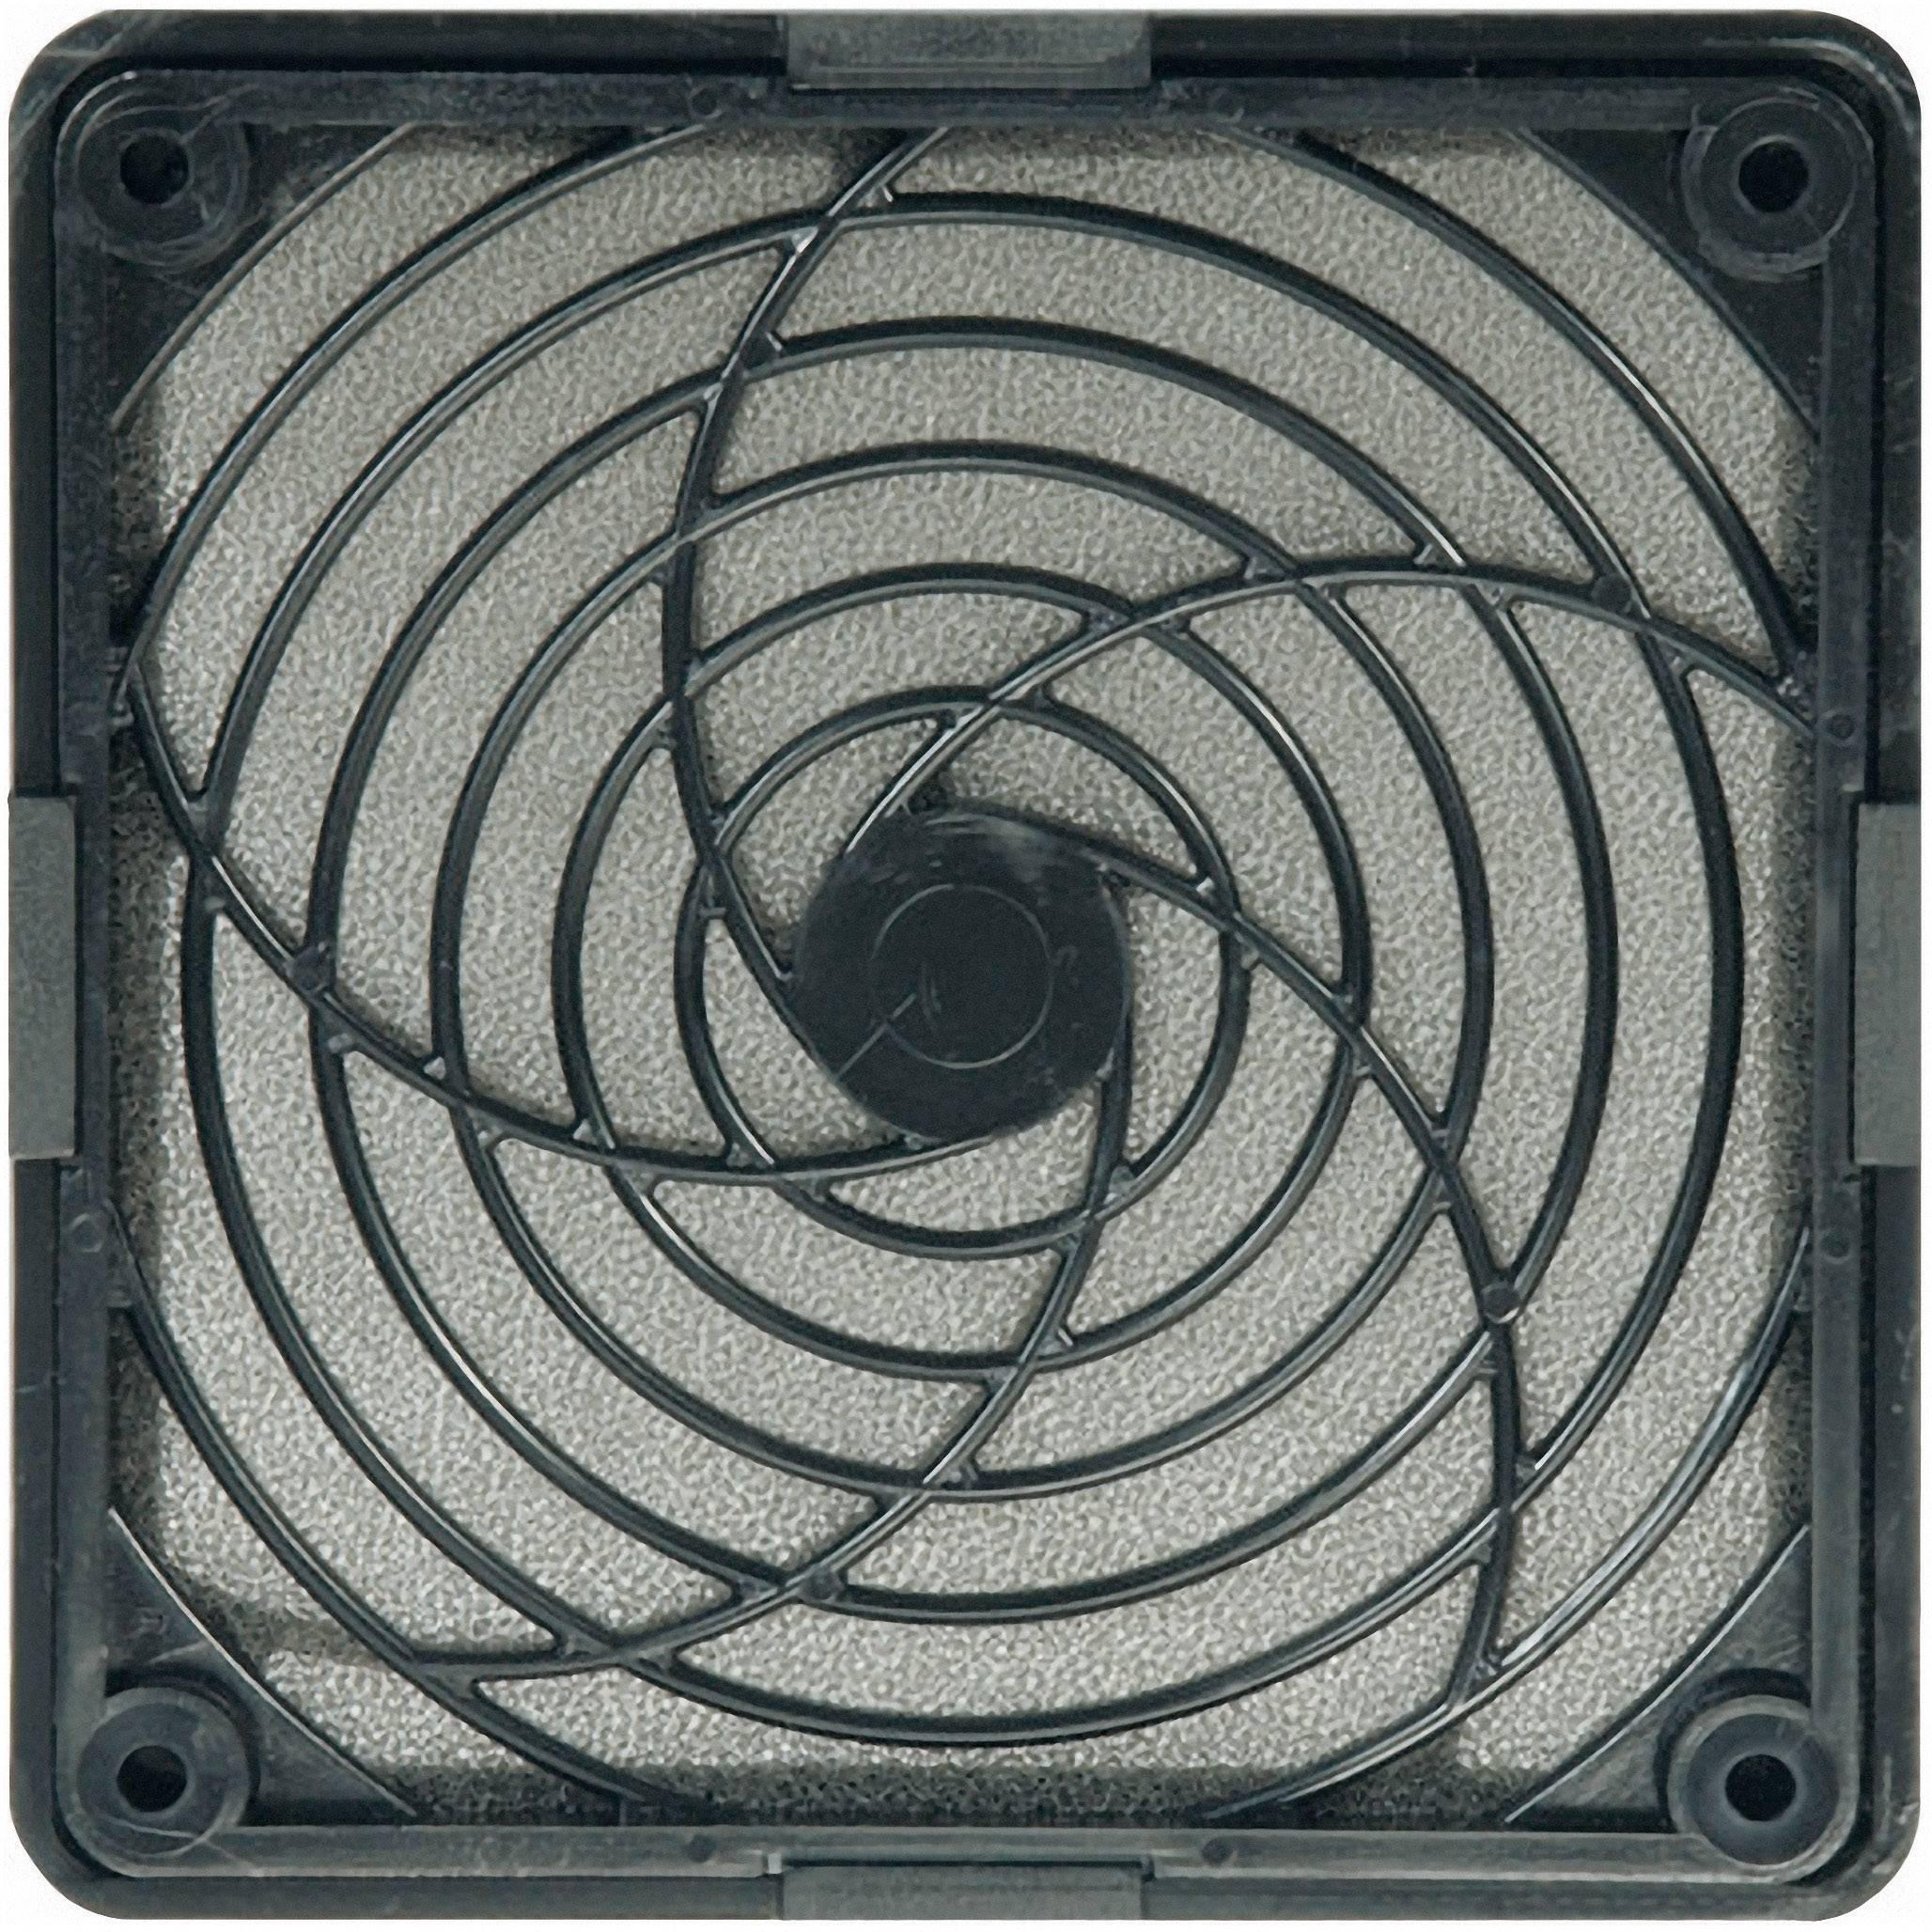 Kryt ventilátoru s filterm Panasonic ASEN88002, 80 mm x 80 mm